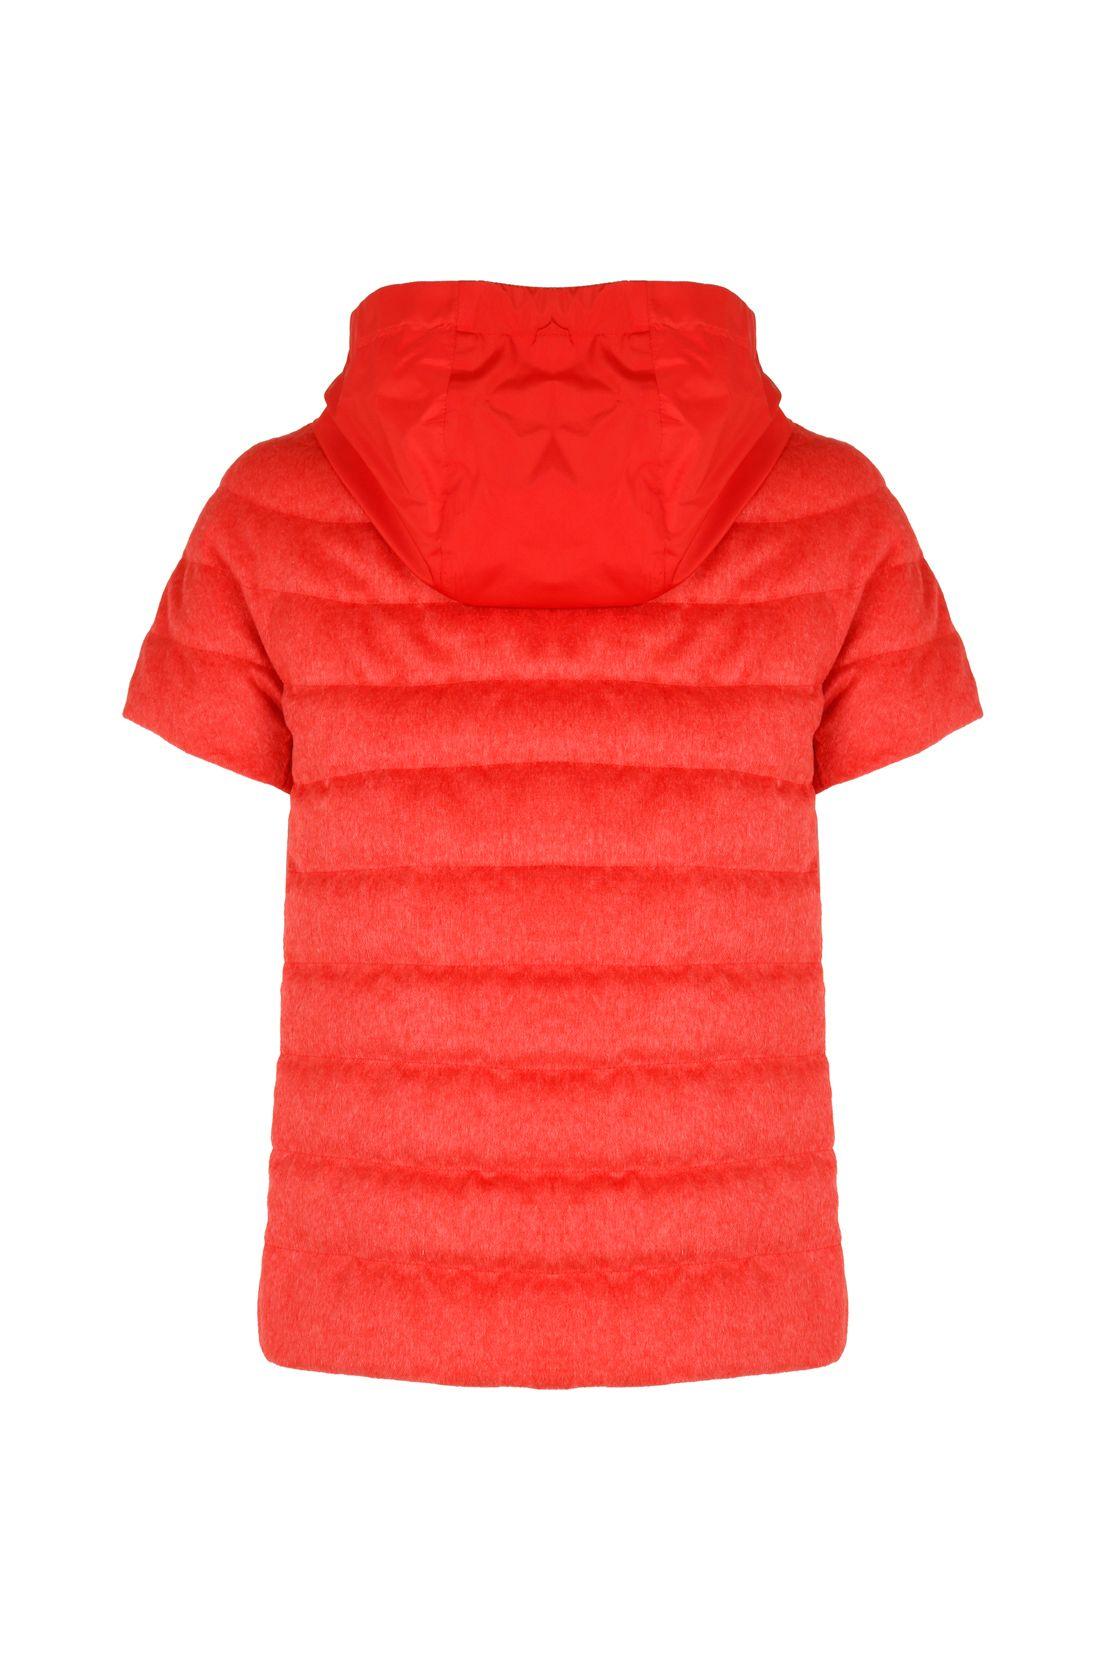 HERNO Jackets HERNO WOMEN'S RED SILK DOWN JACKET